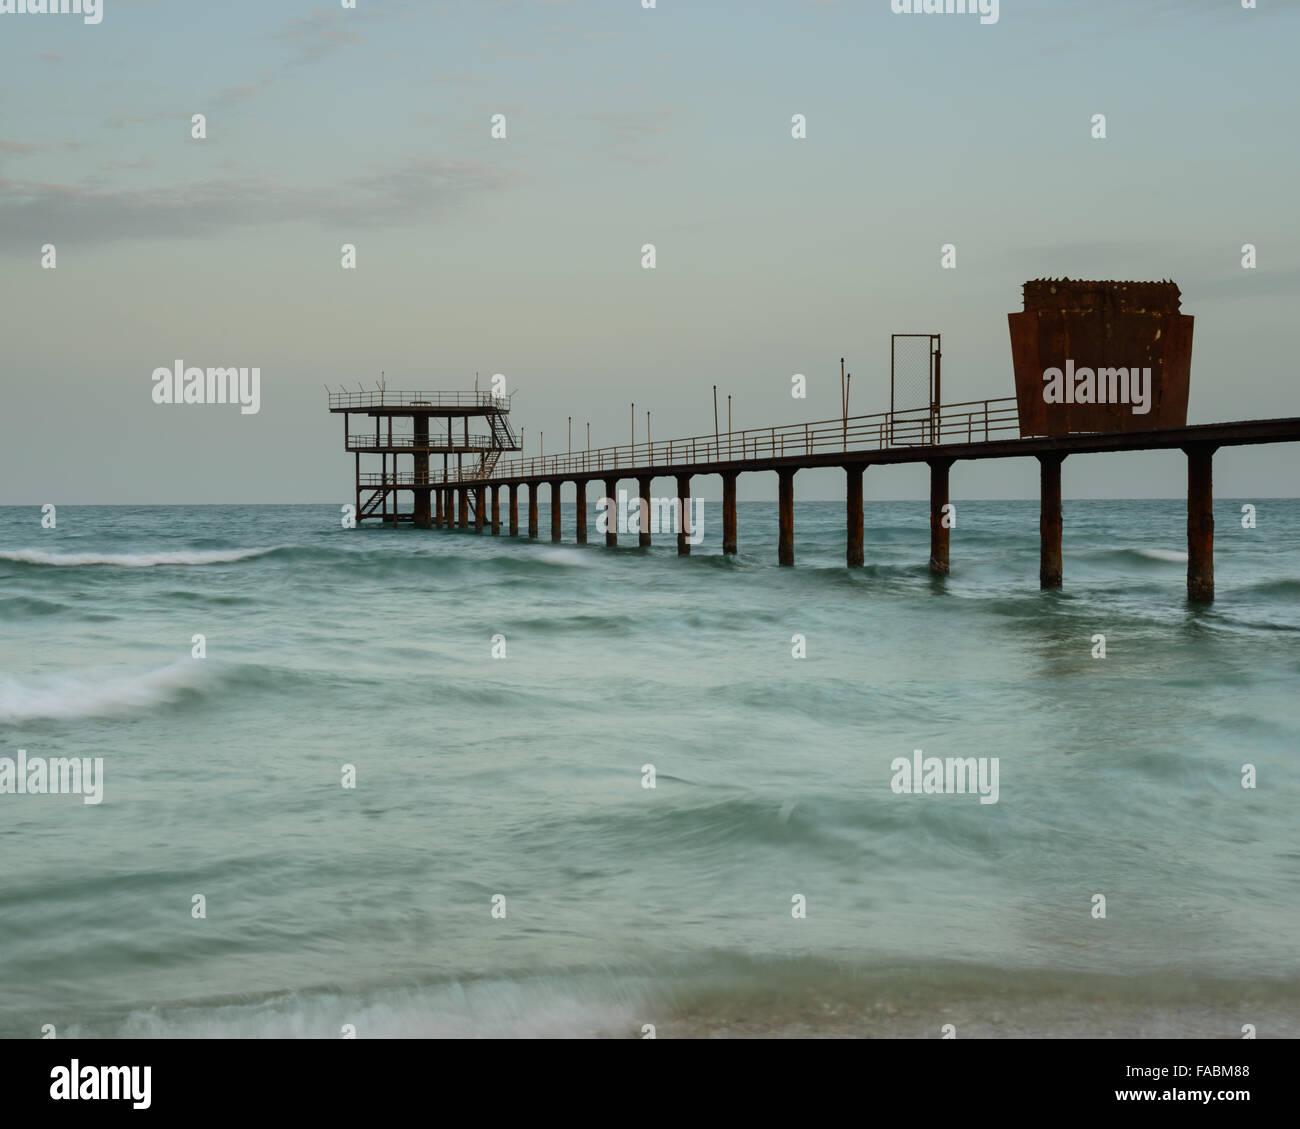 Al Mulla Stock Photos & Al Mulla Stock Images - Alamy